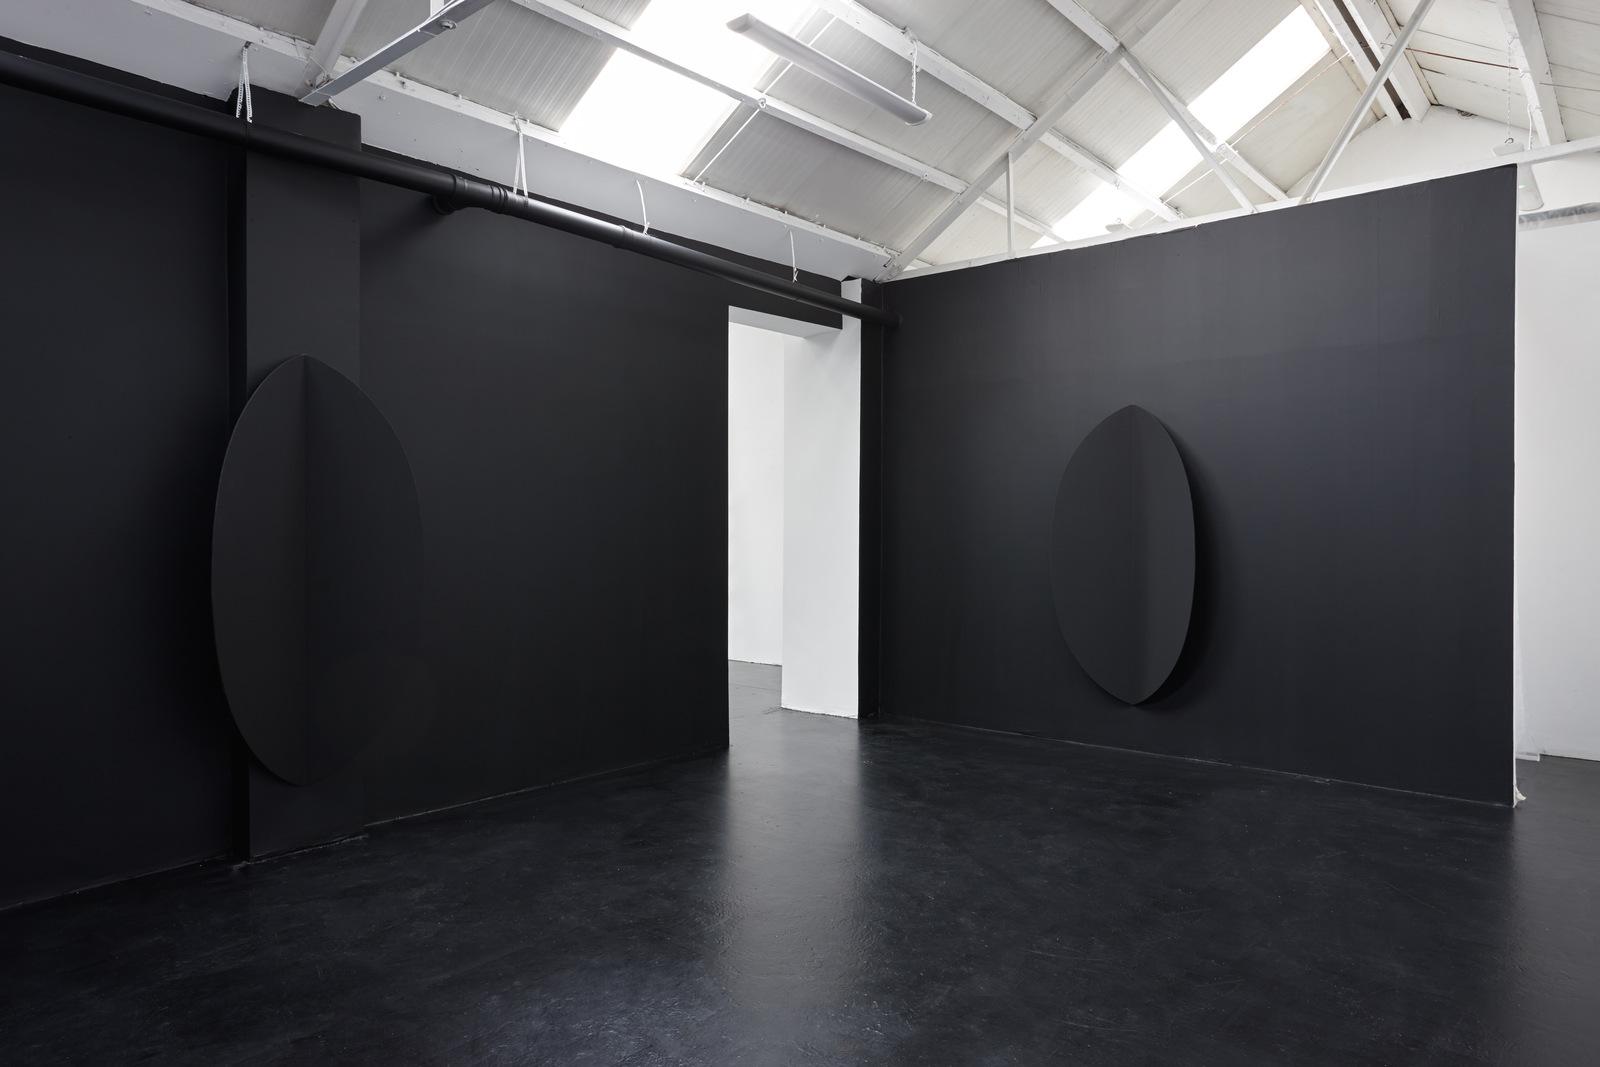 Ryan Estep - 5 - Installation View VII